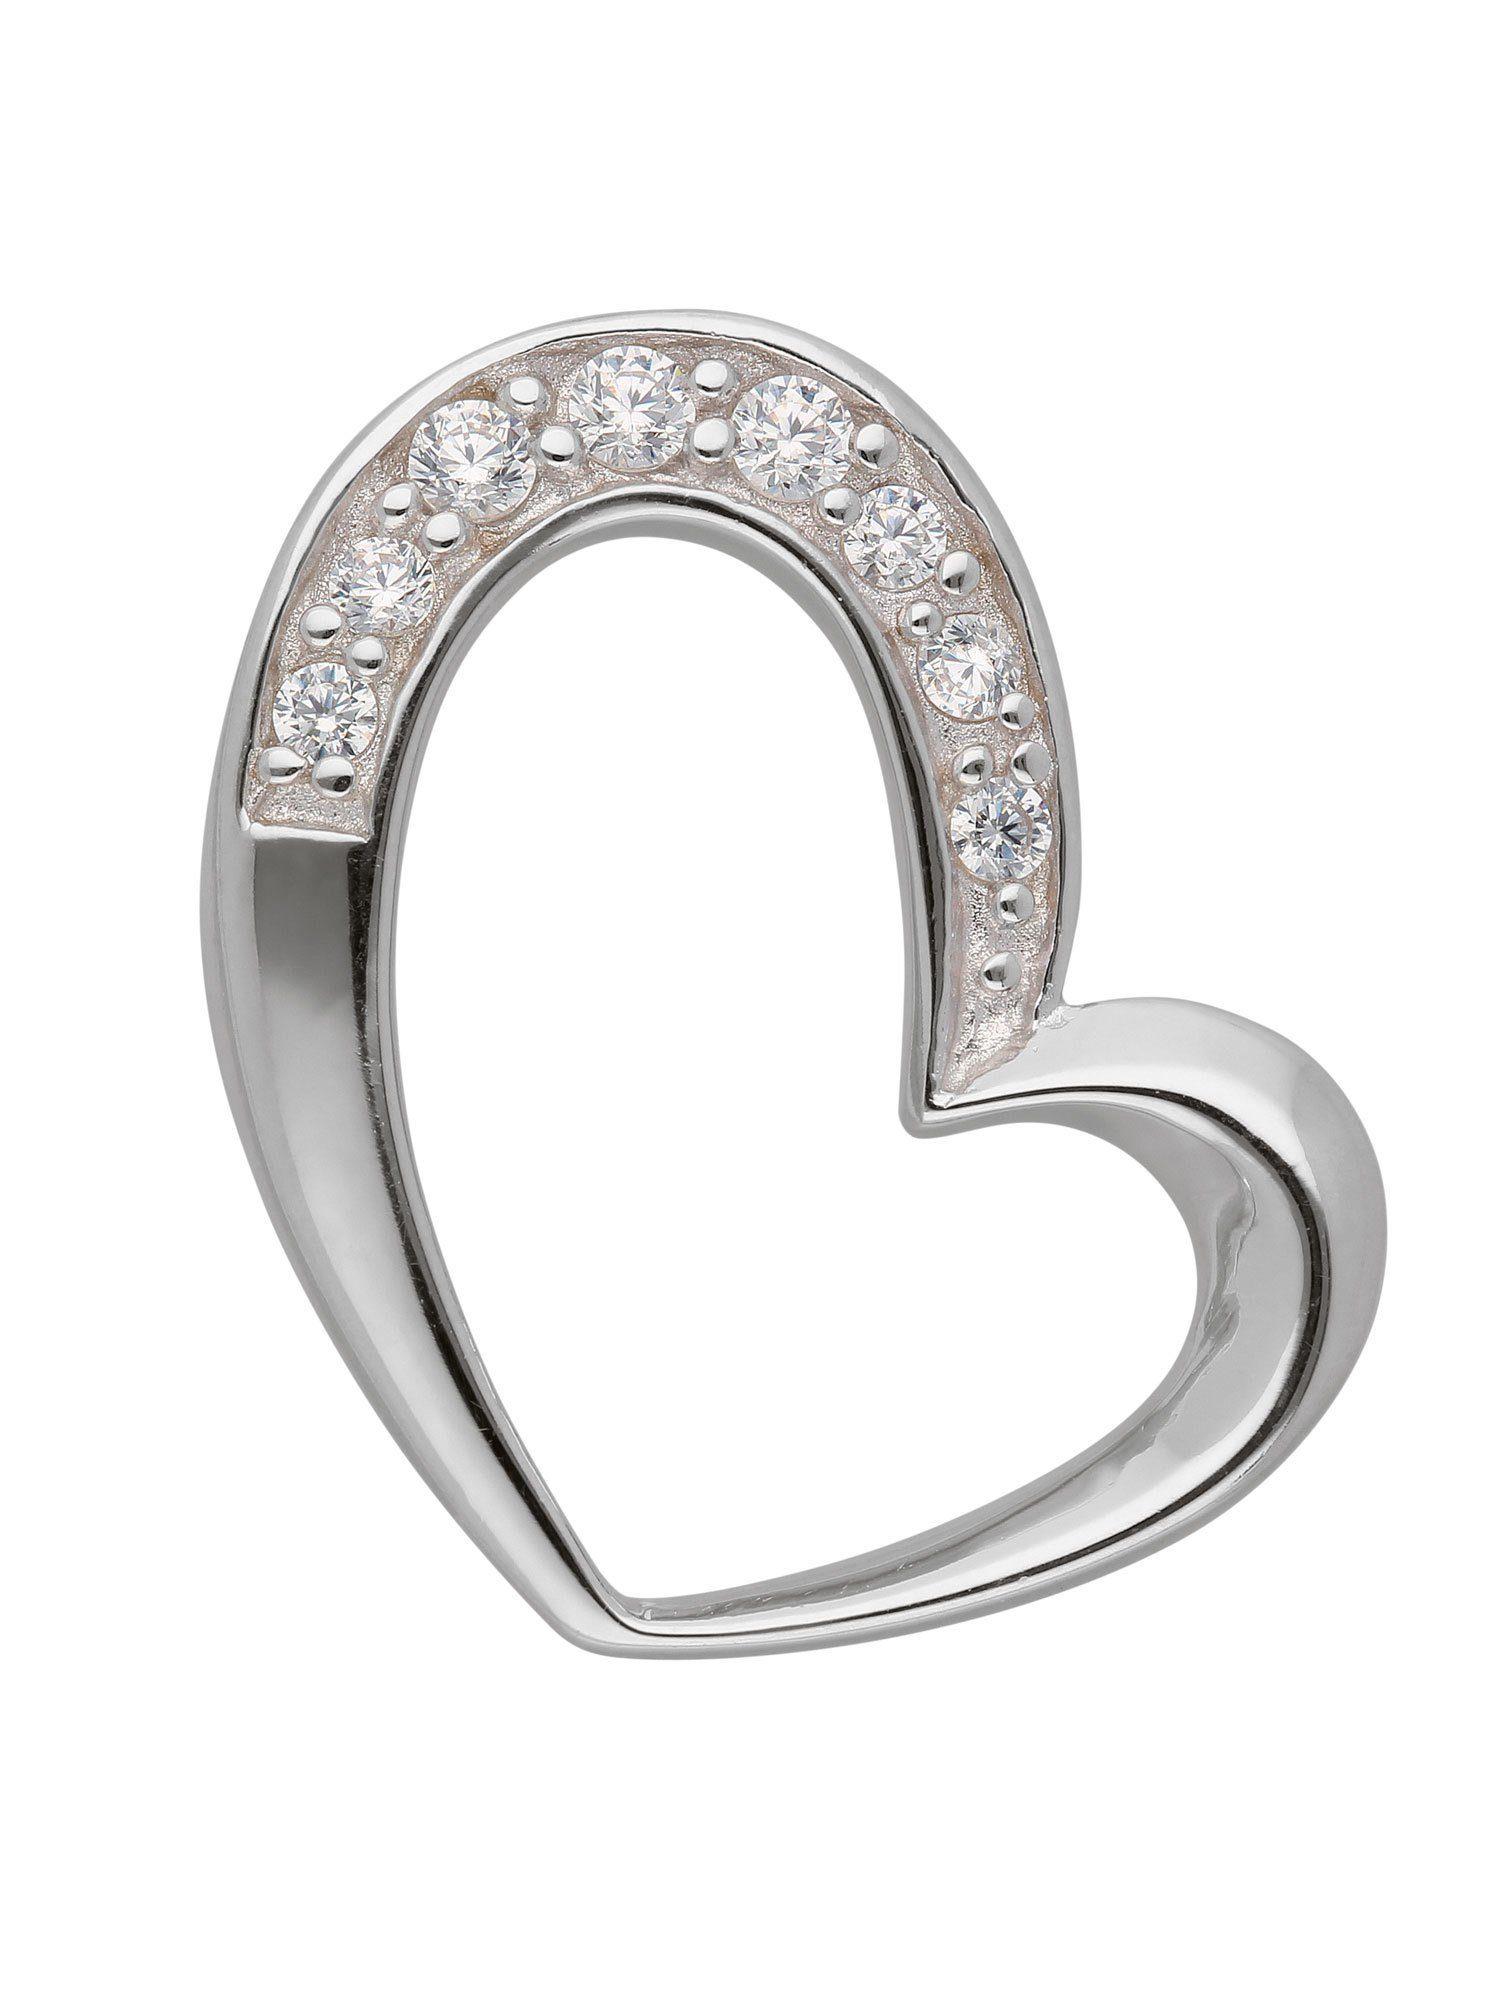 Adelia´s Kettenanhänger »Silber Anhänger« Herz 925 Sterling Silber mit Zirkonia